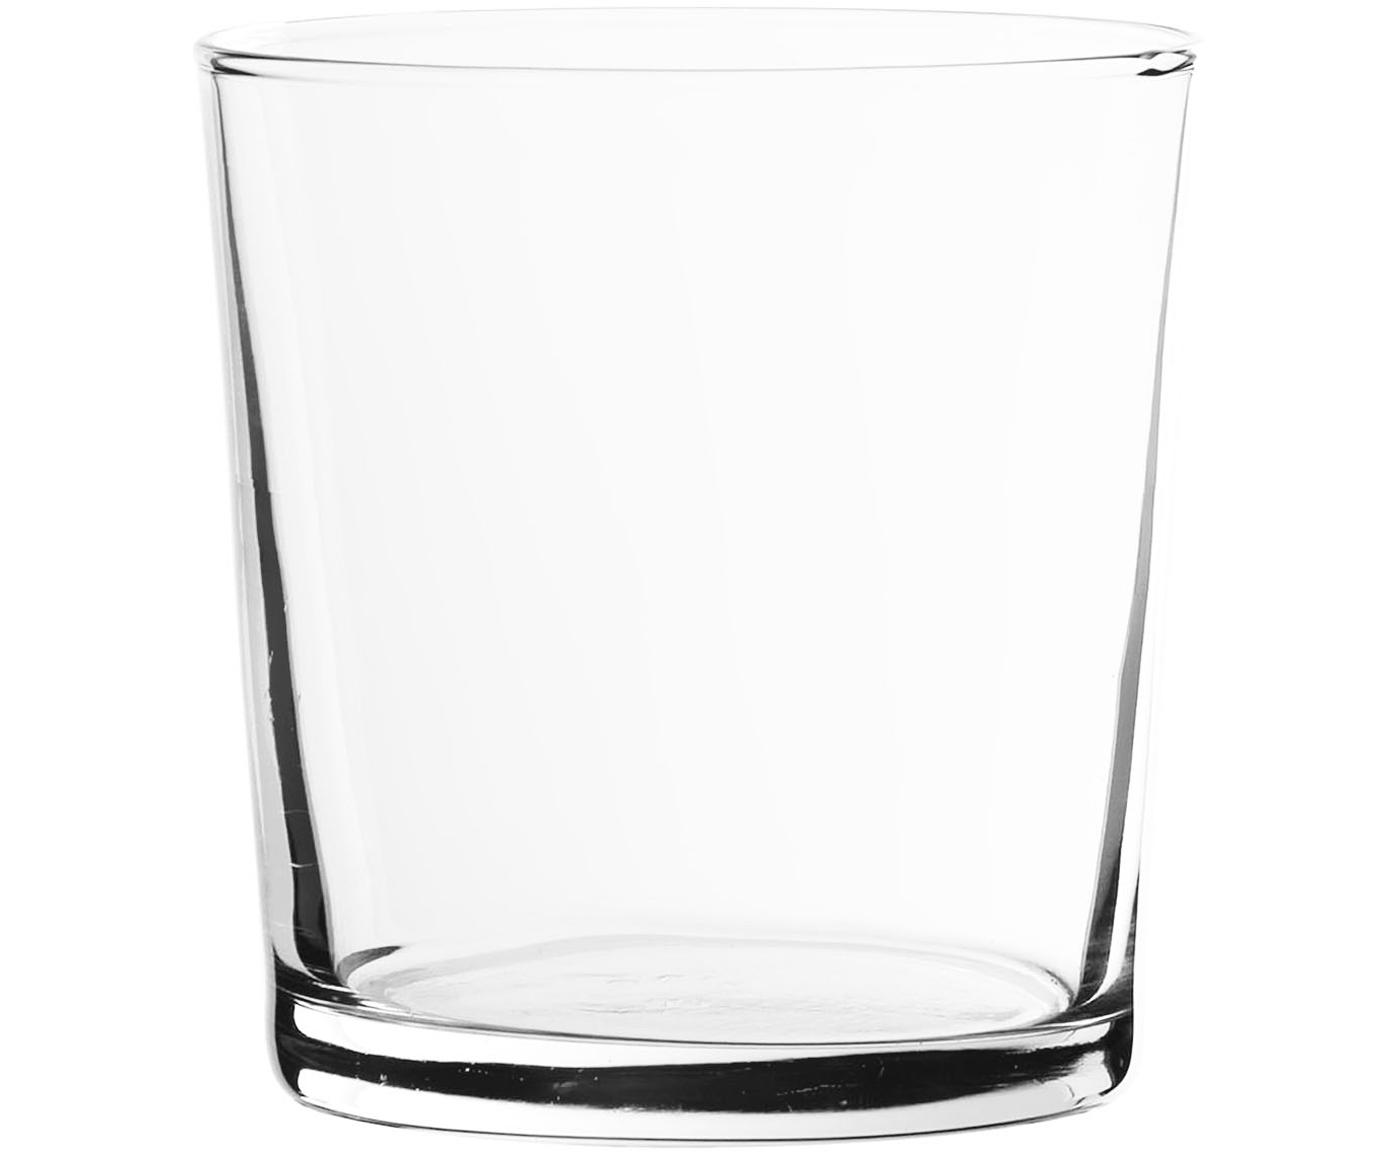 Bicchiere acqua Simple 6 pz, Vetro, Trasparente, 370 ml